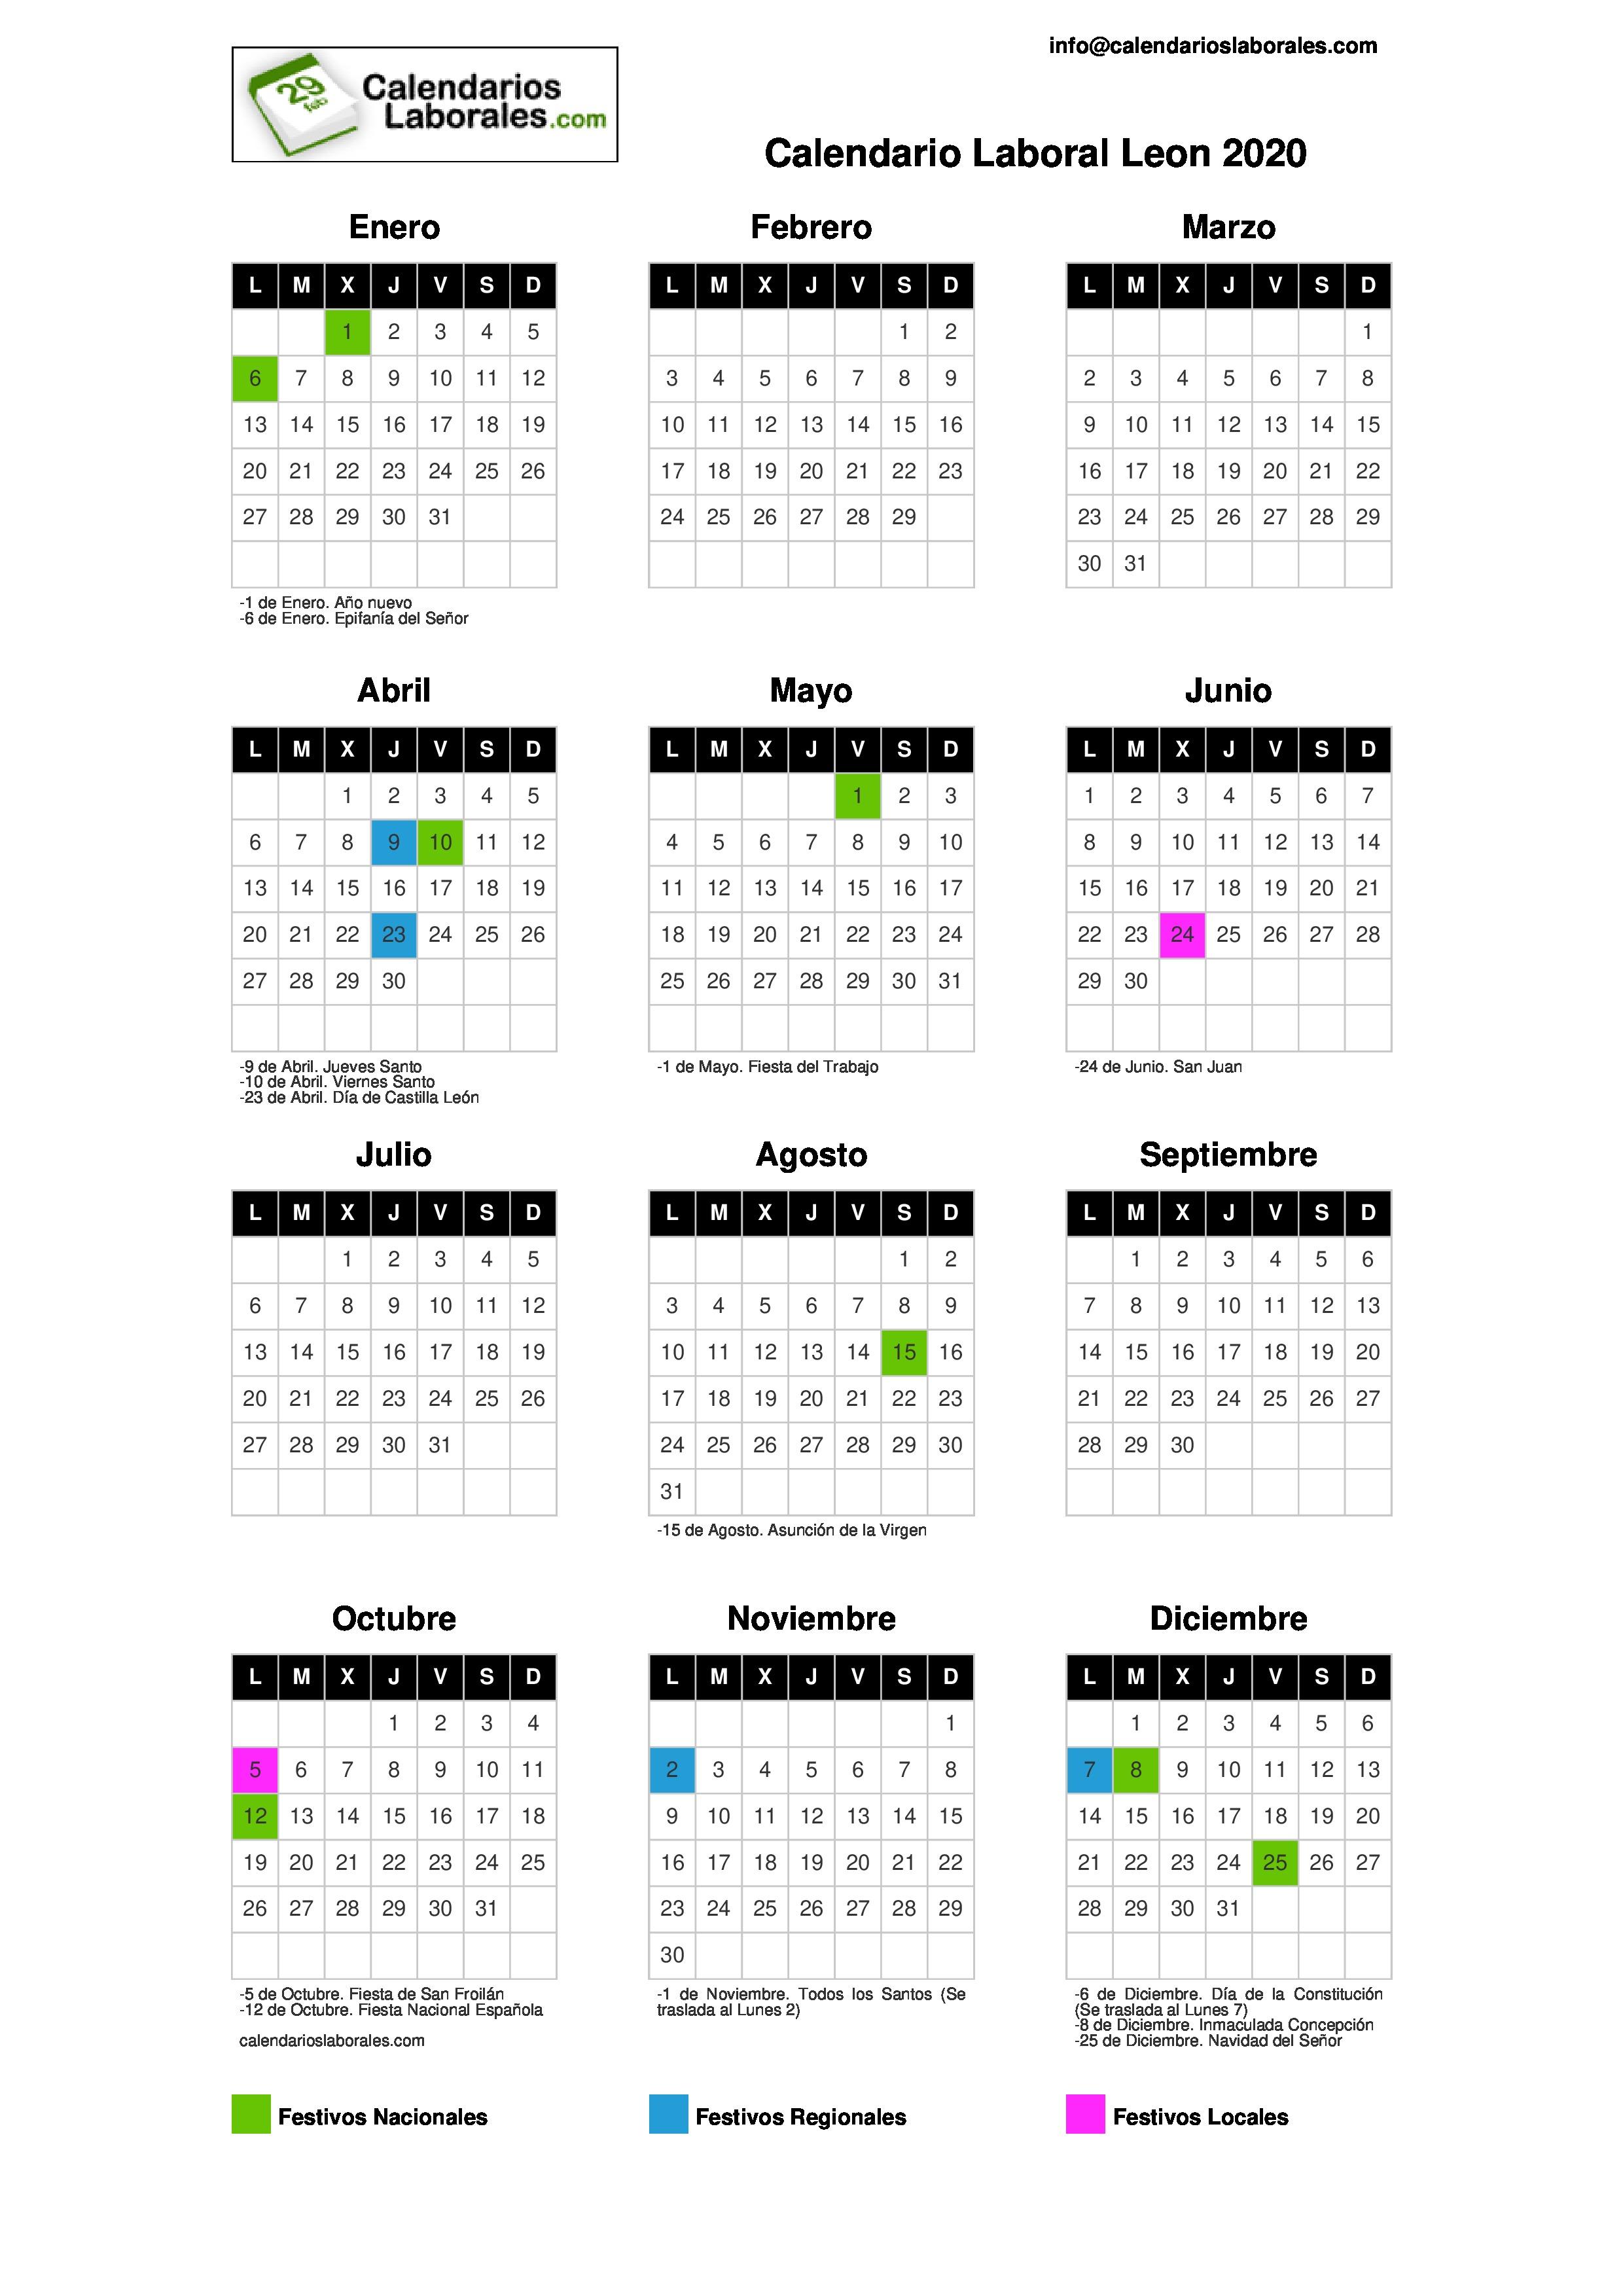 Calendario Junio Julio 2020.Calendario Laboral Leon 2020